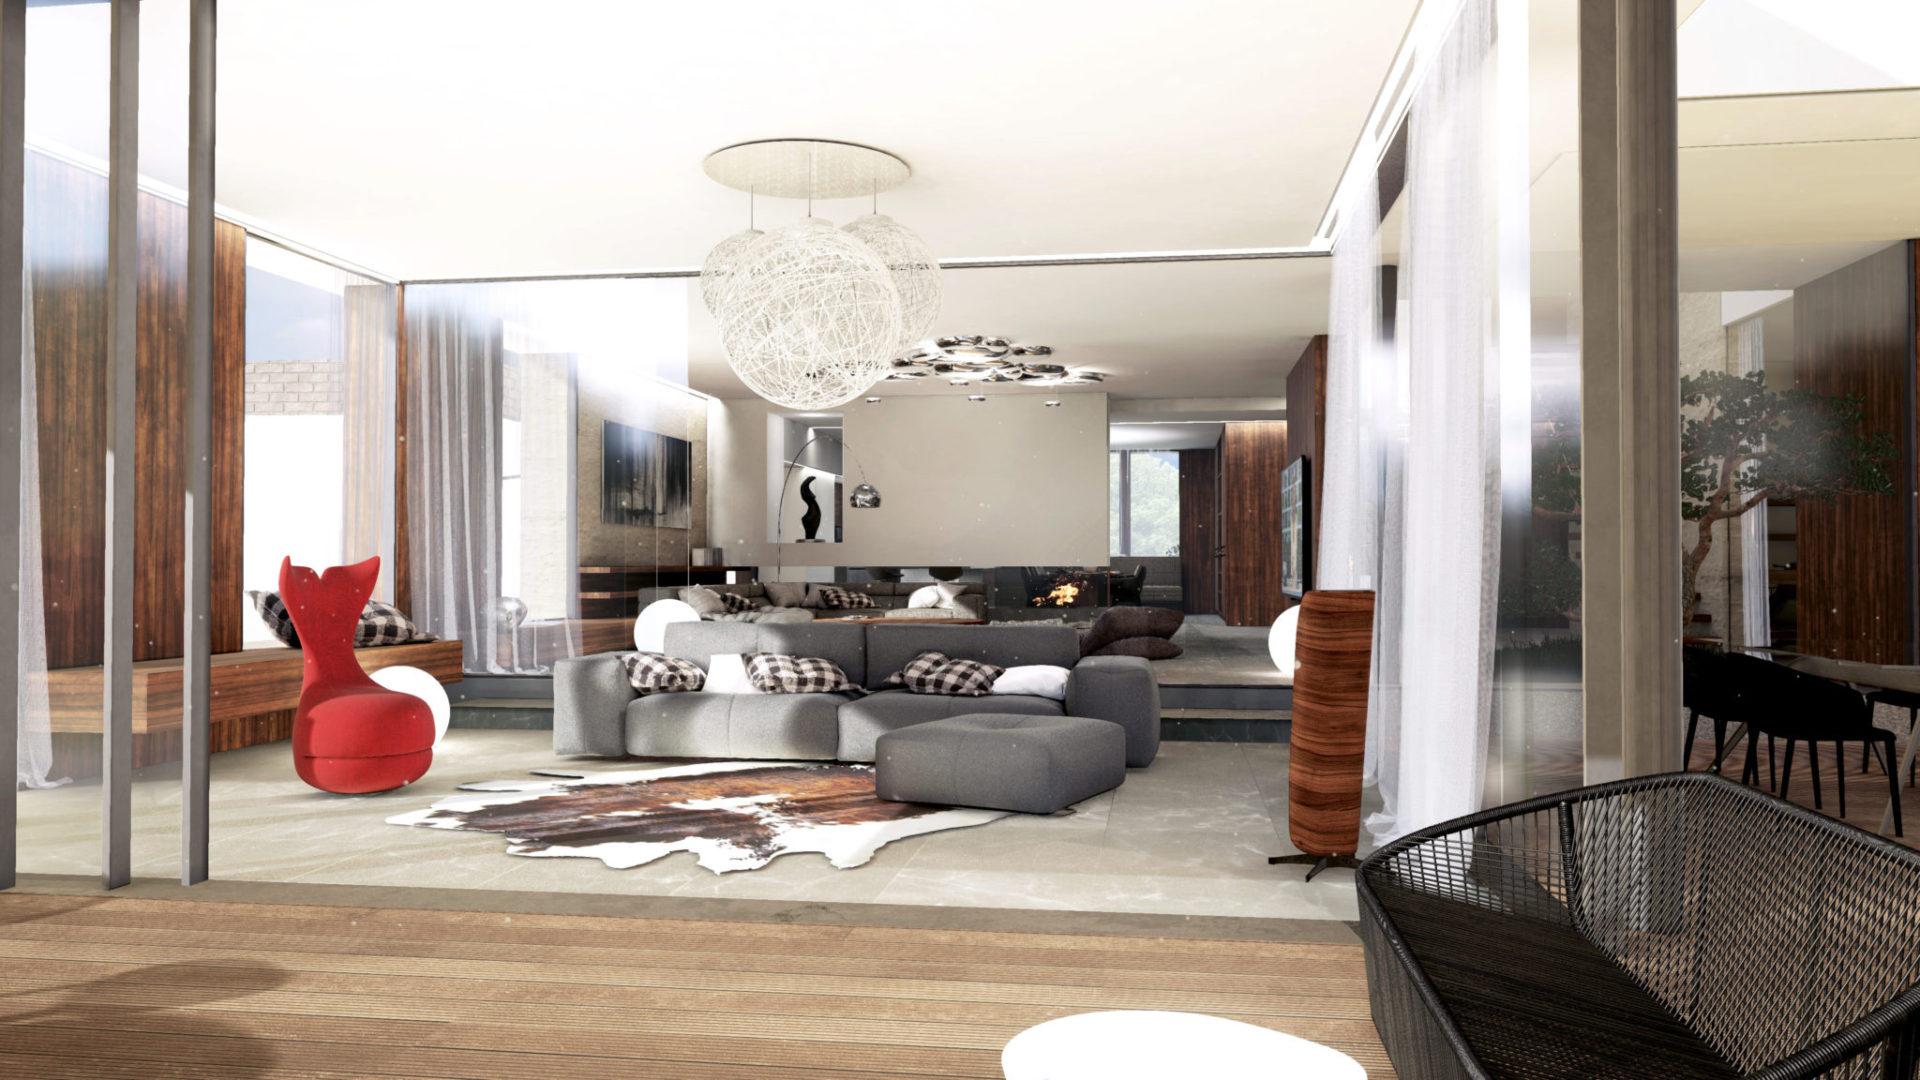 residence Archviz